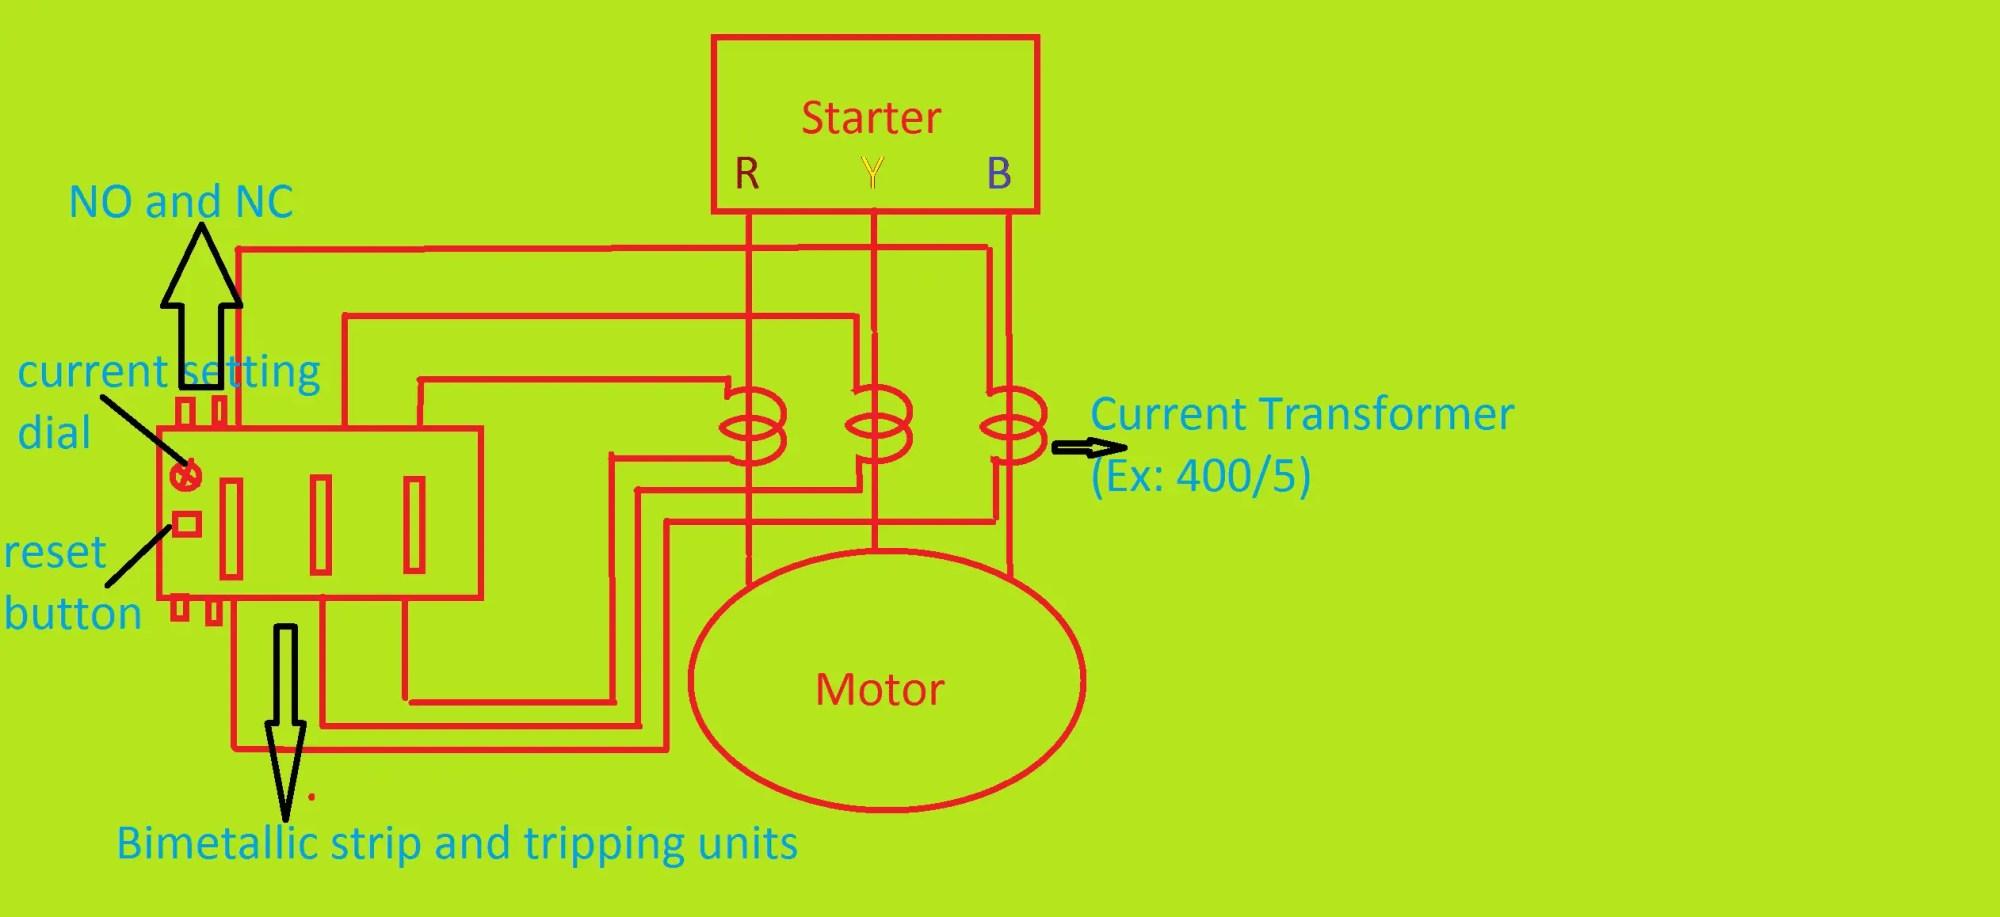 hight resolution of 150 5 current transformer wiring diagram wiring diagram centre 150 5 current transformer wiring diagram